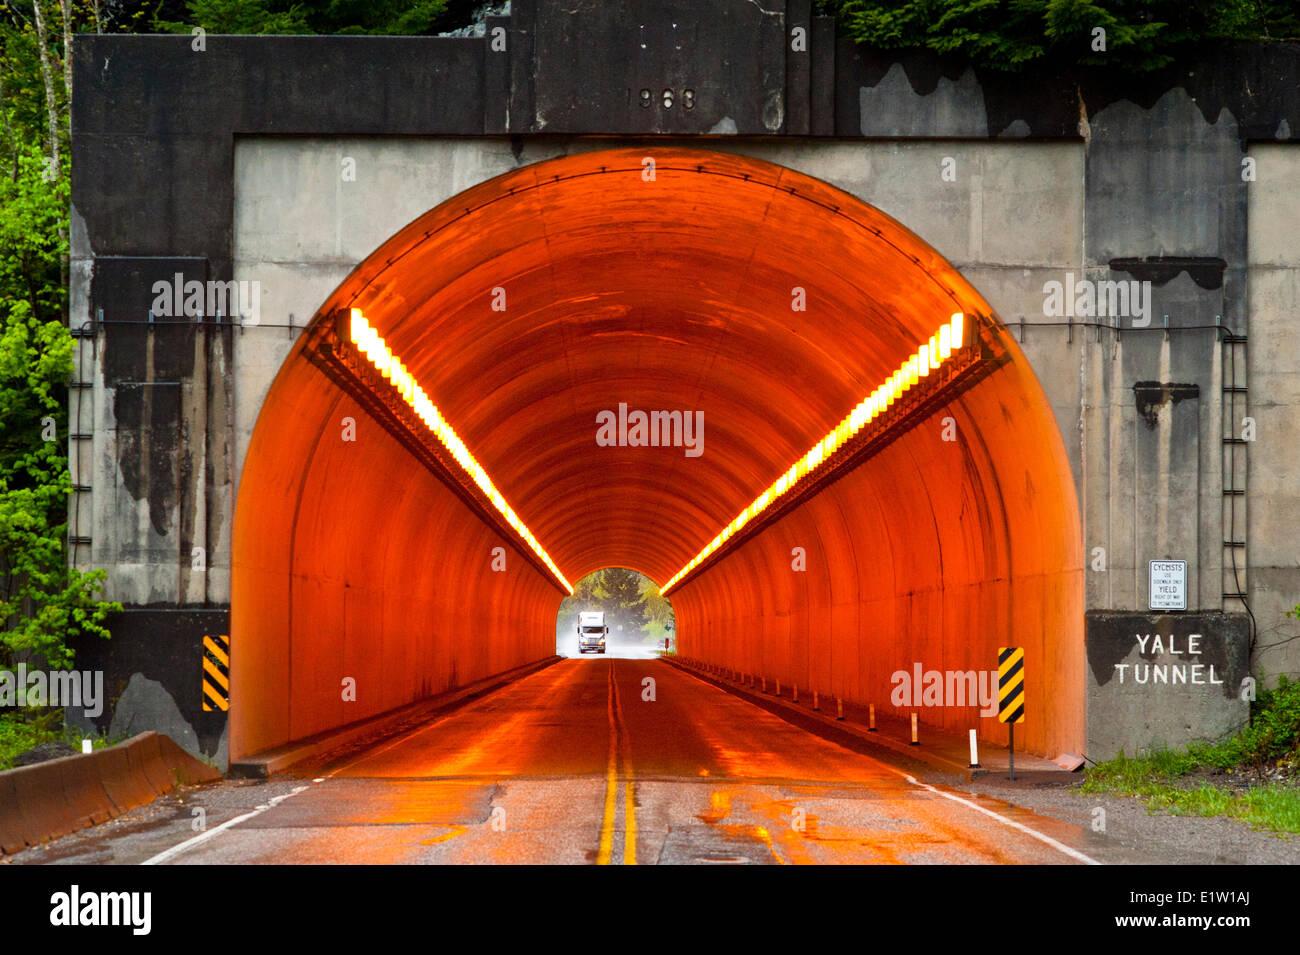 Sodium vapor lights used to illuminate a tunnel. - Stock Image